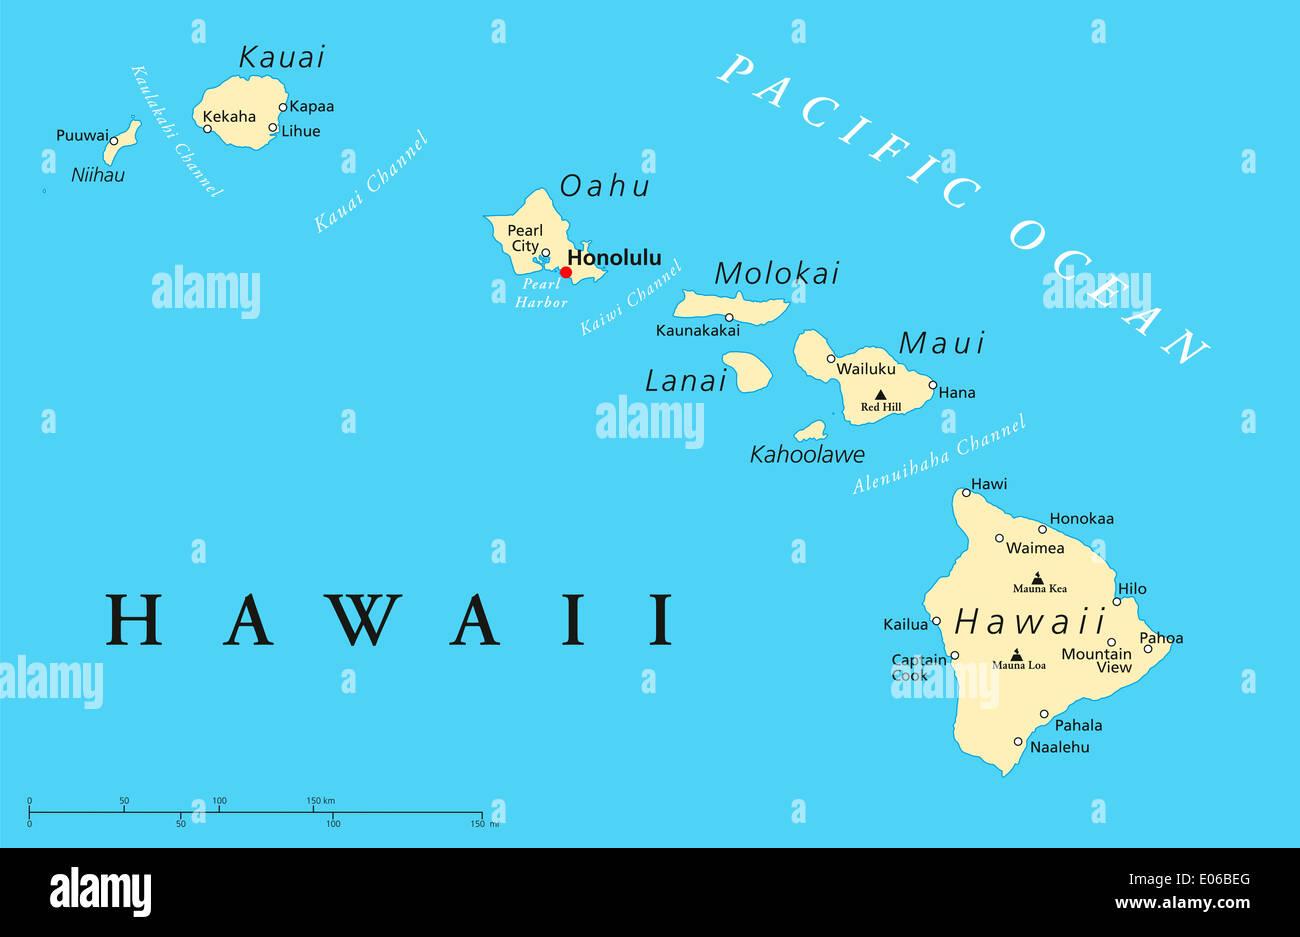 Hawaii Islands Political Map Stock Photo 68982216 Alamy